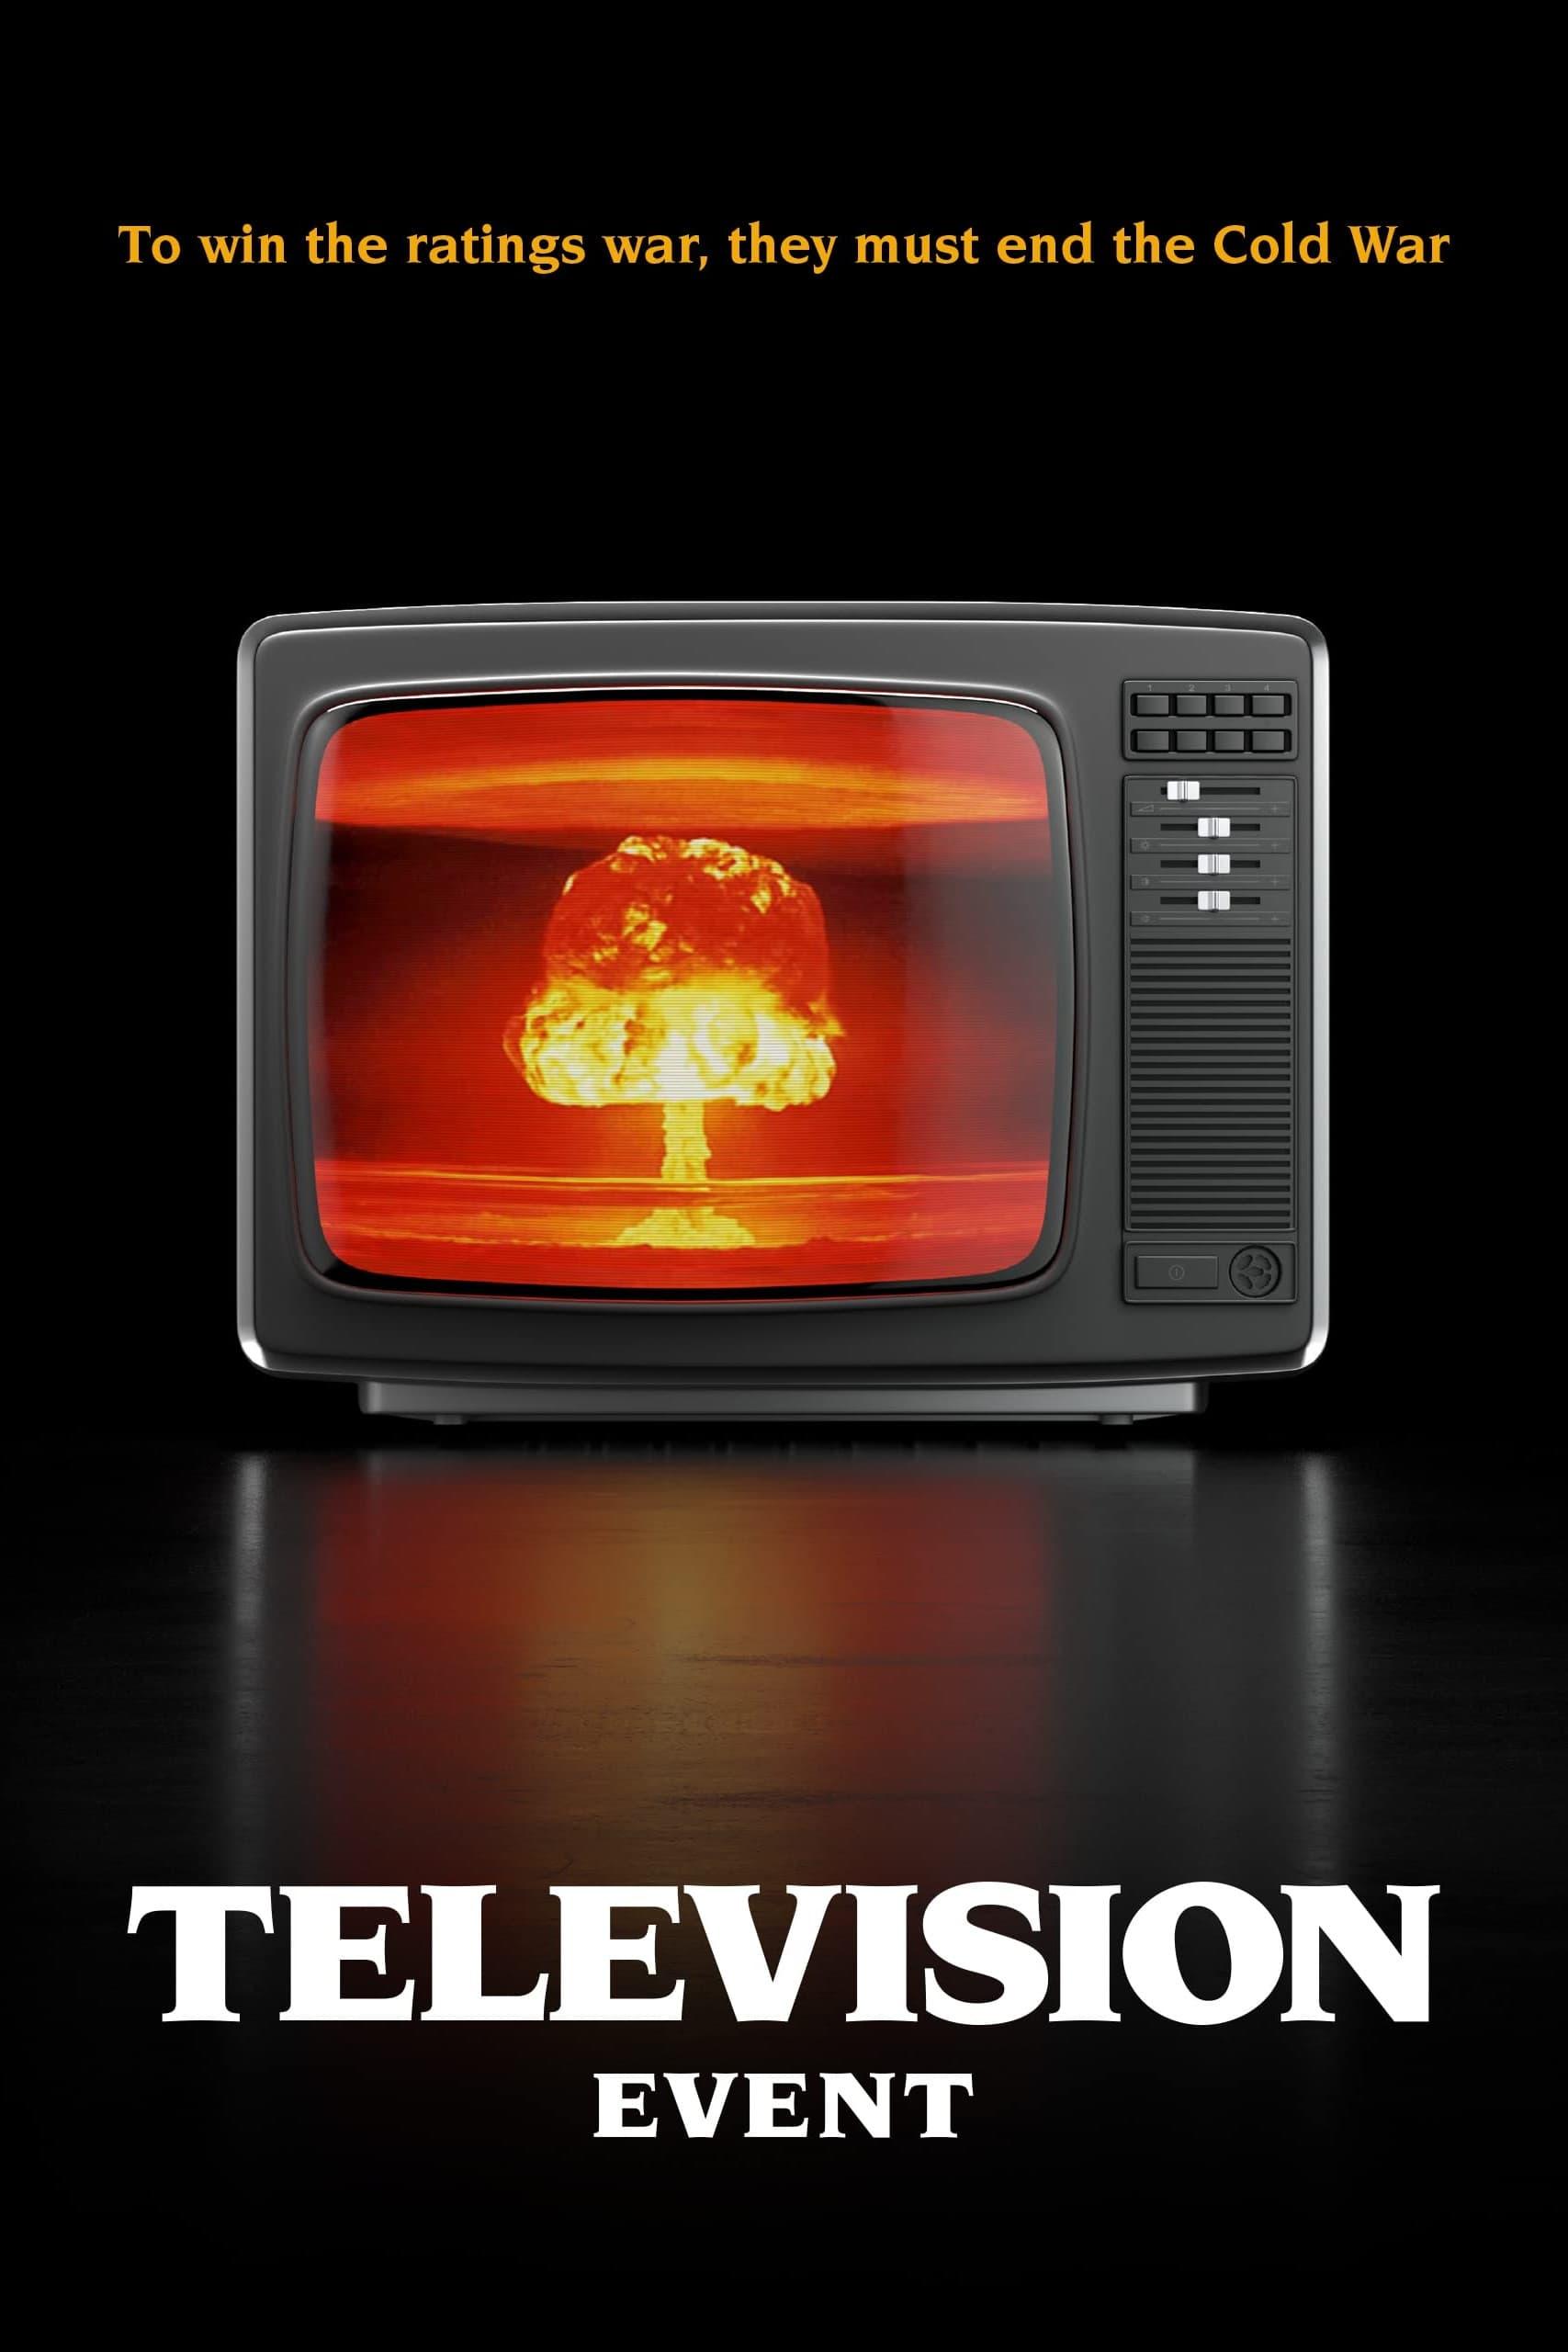 Television Event